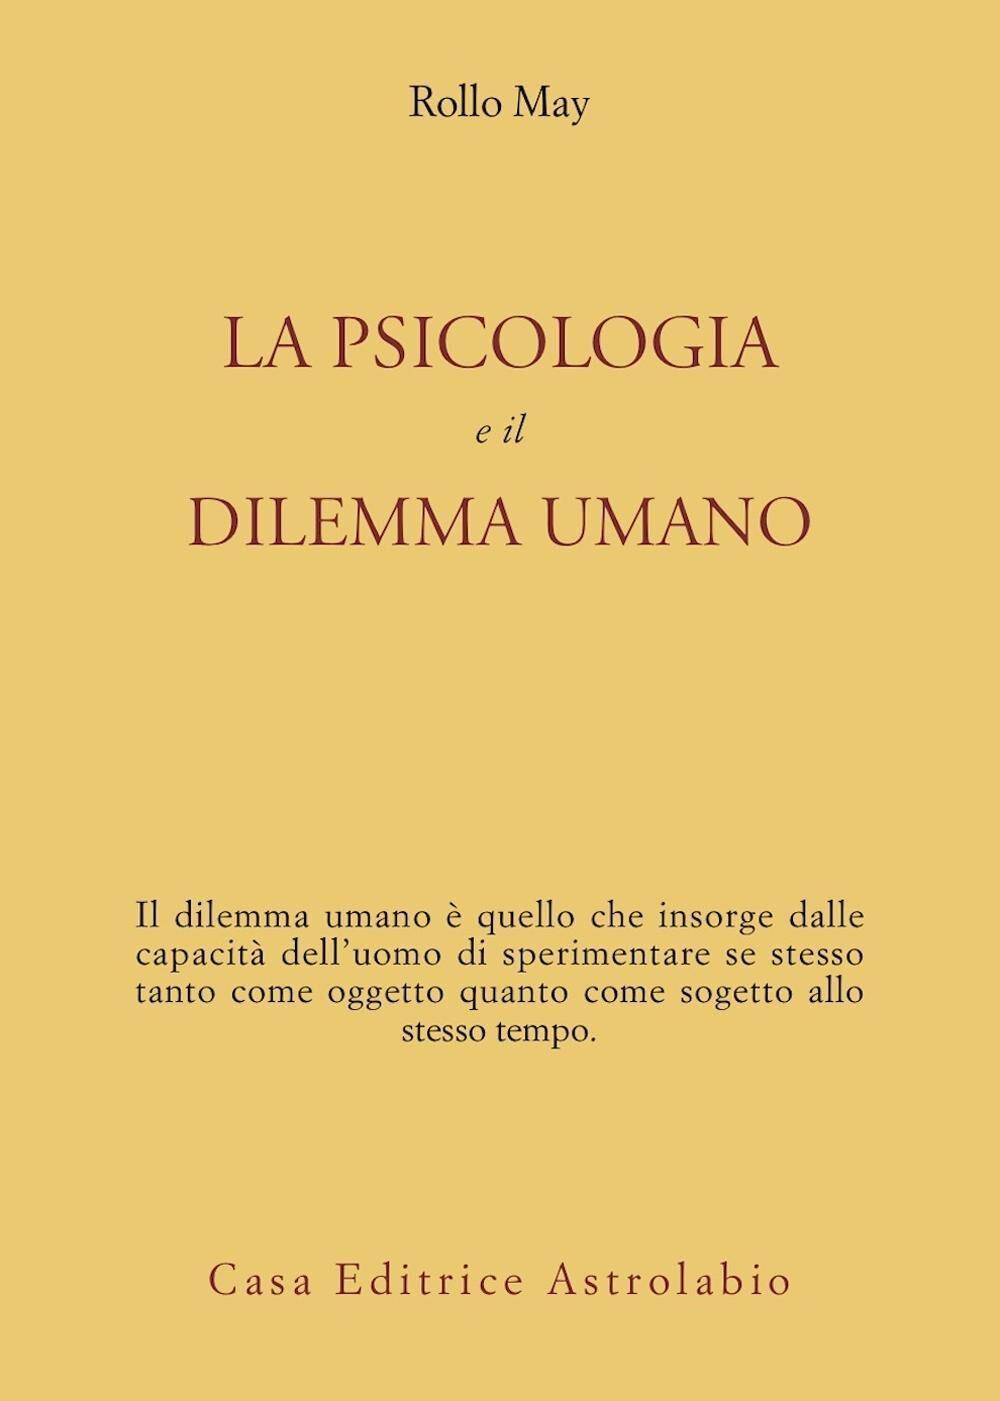 La psicologia e il dilemma umano